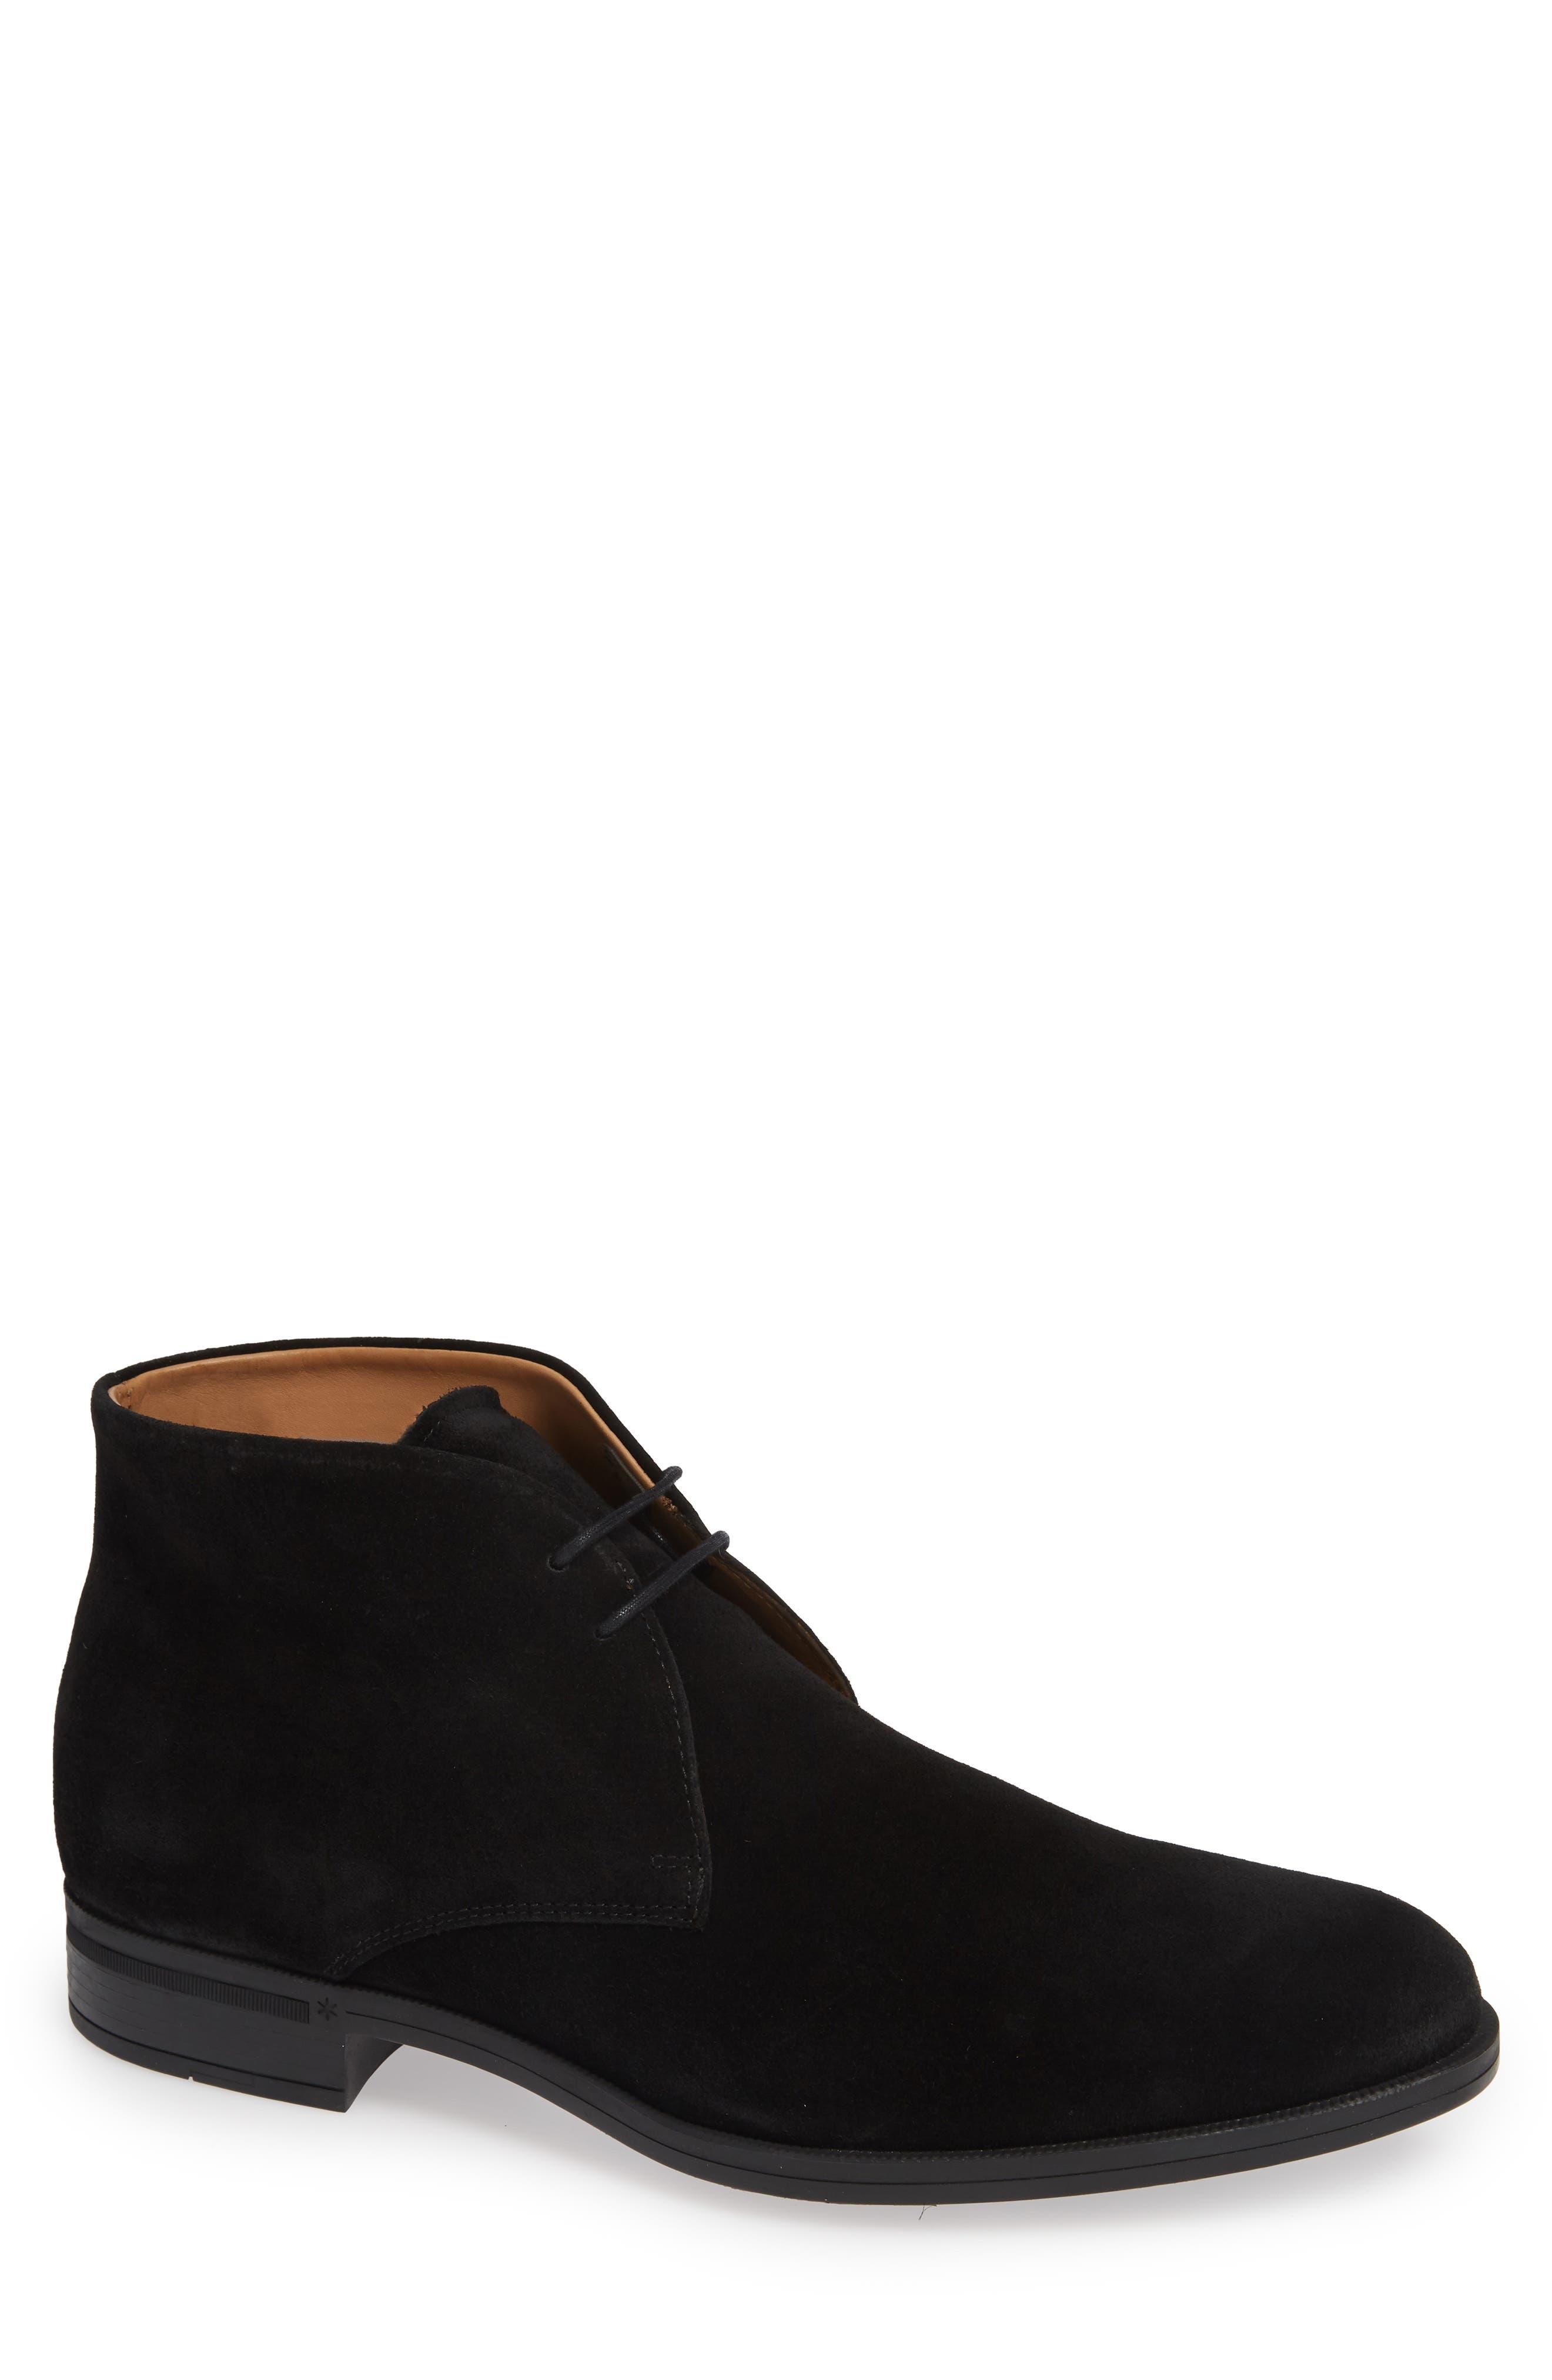 Vince Camuto Iden Chukka Boot- Black